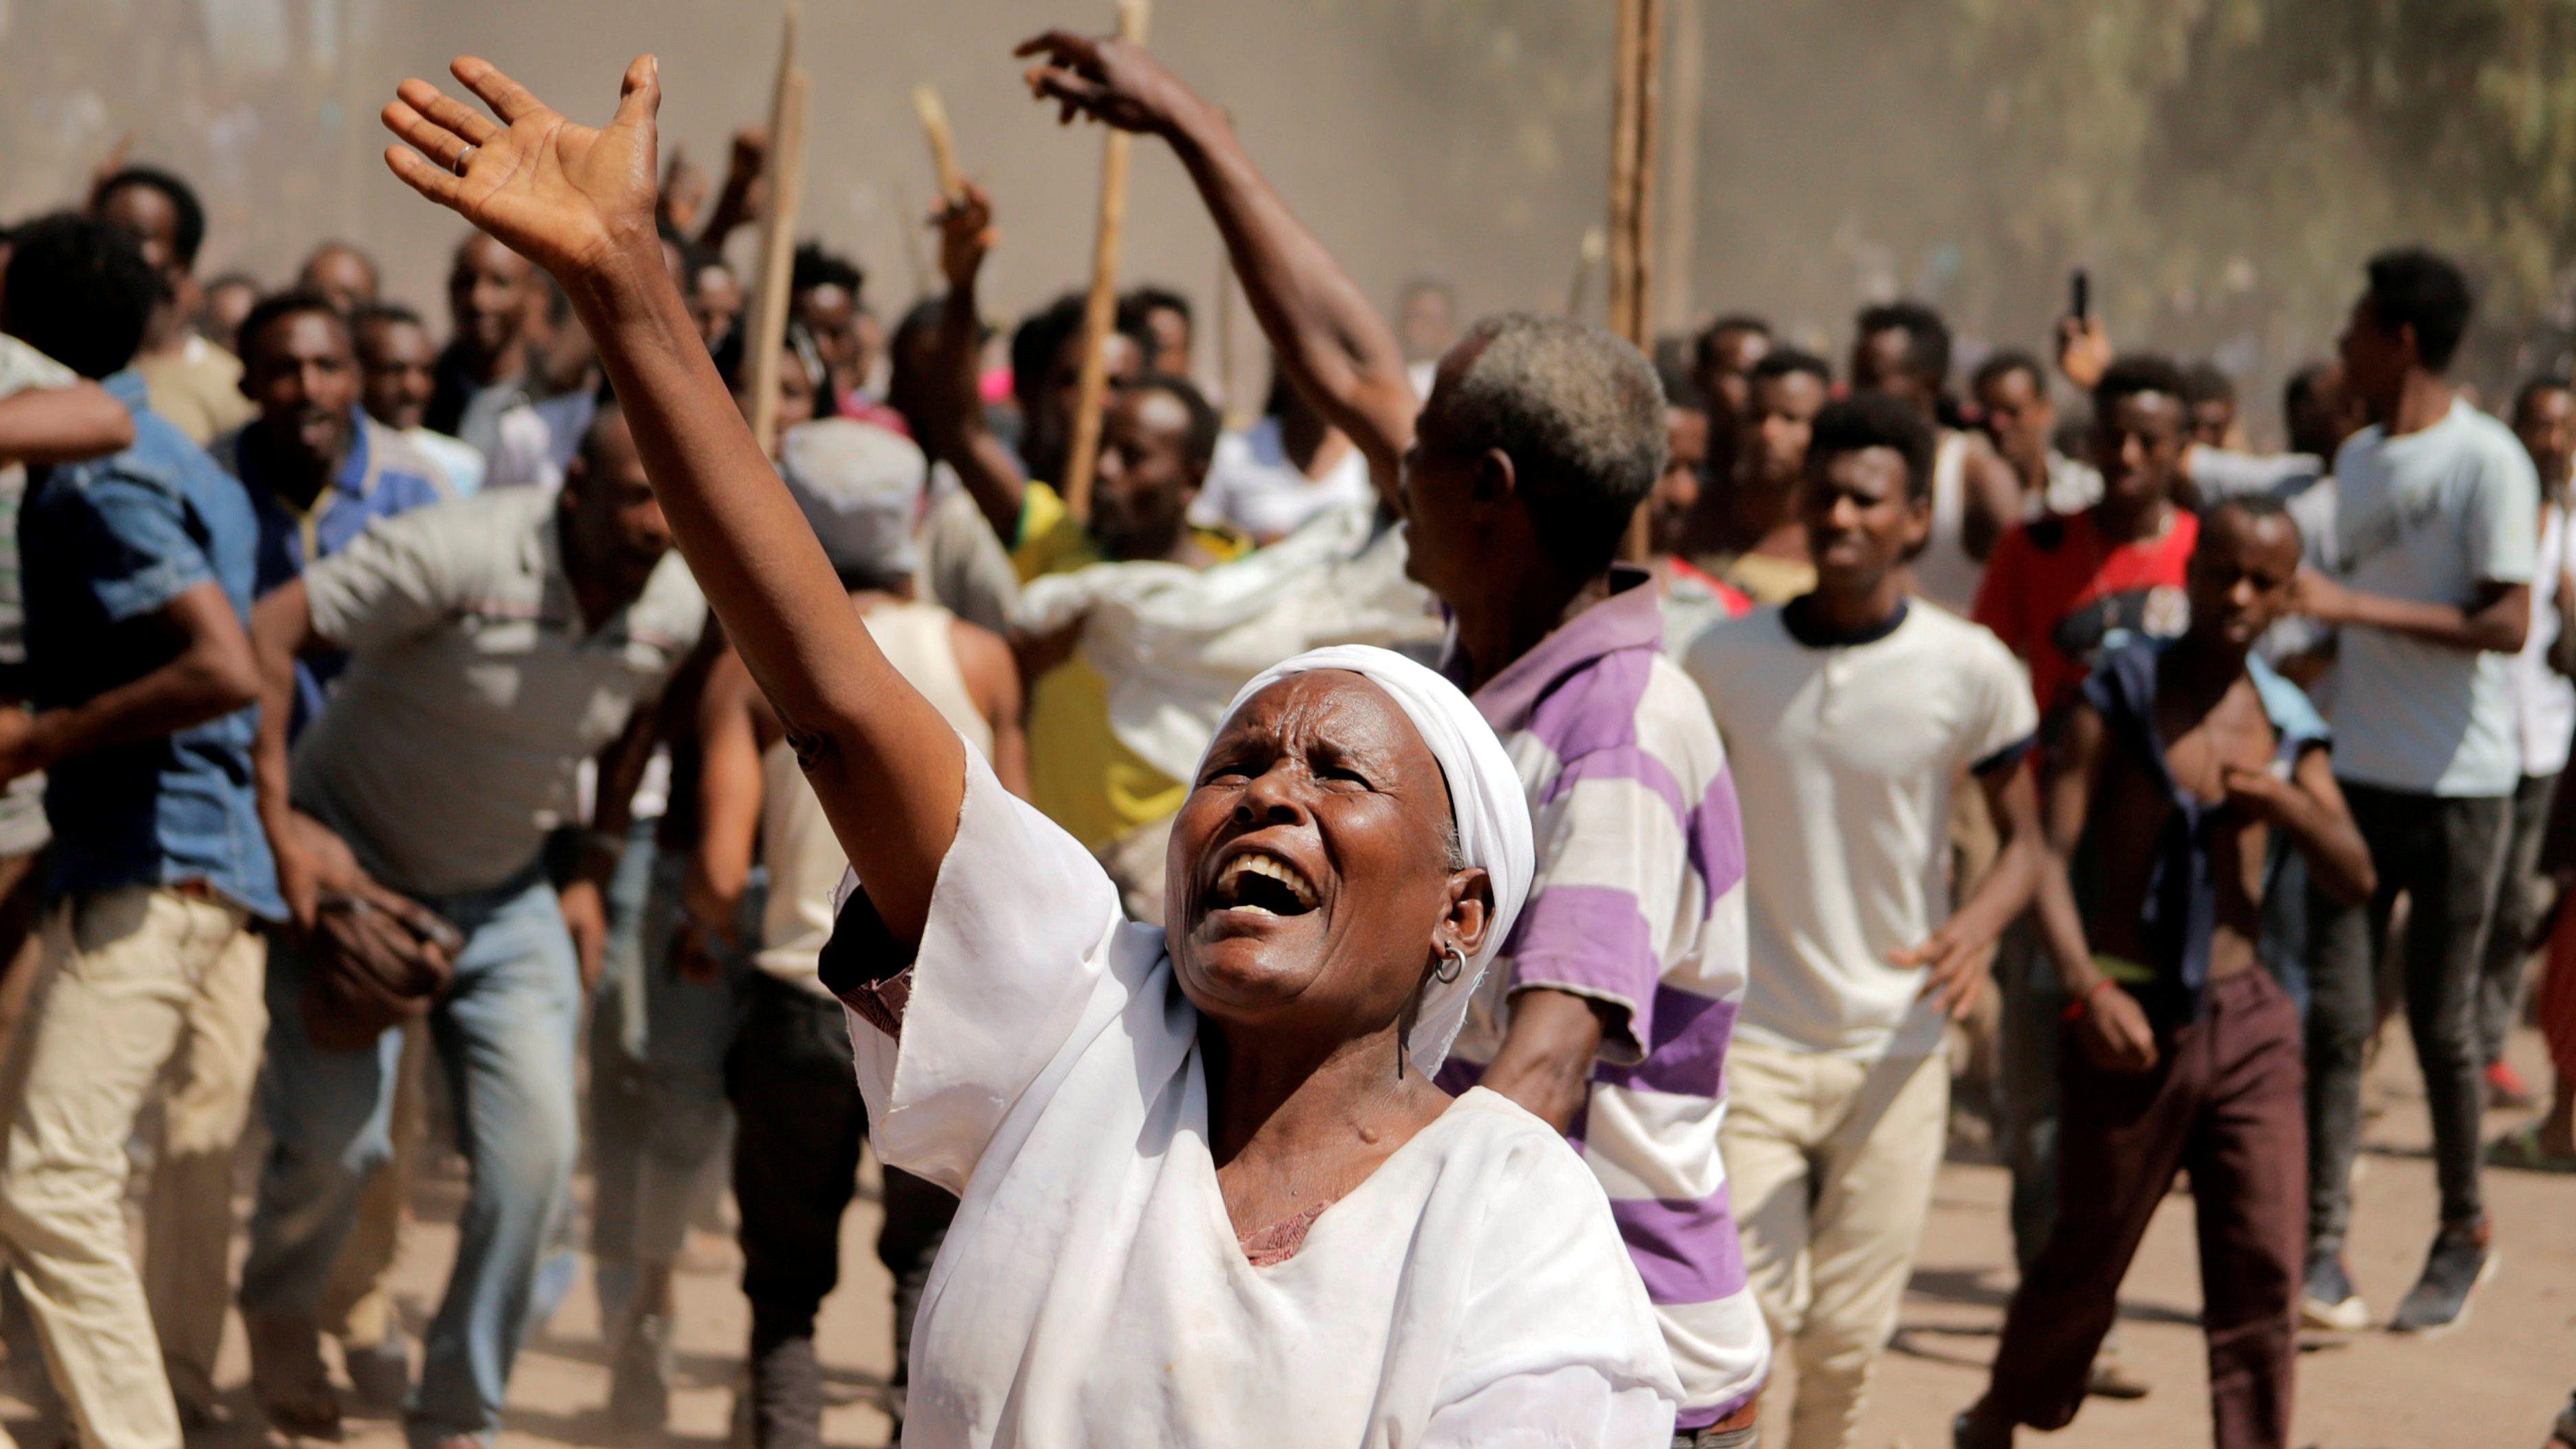 FILE PHOTO: Supporters of Bekele Gerba, secretary general of the Oromo Federalist Congress (OFC), chant slogans to celebrate Gerba's release from prison, in Adama, Oromia Region, Ethiopia February 14, 2018.